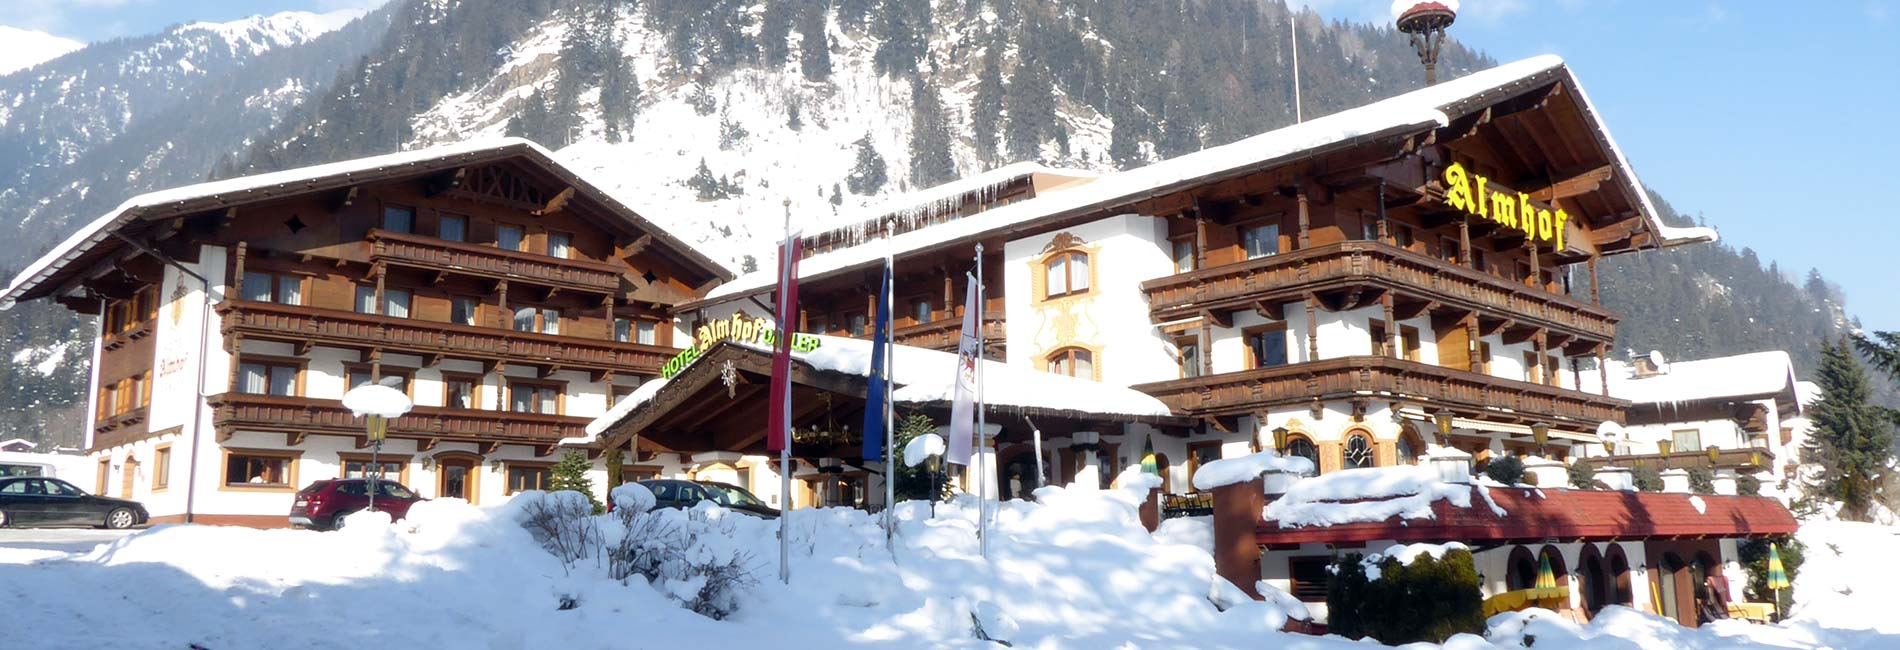 Hotel Almhof Winterurlaub im Stubaital in Tirol Austria